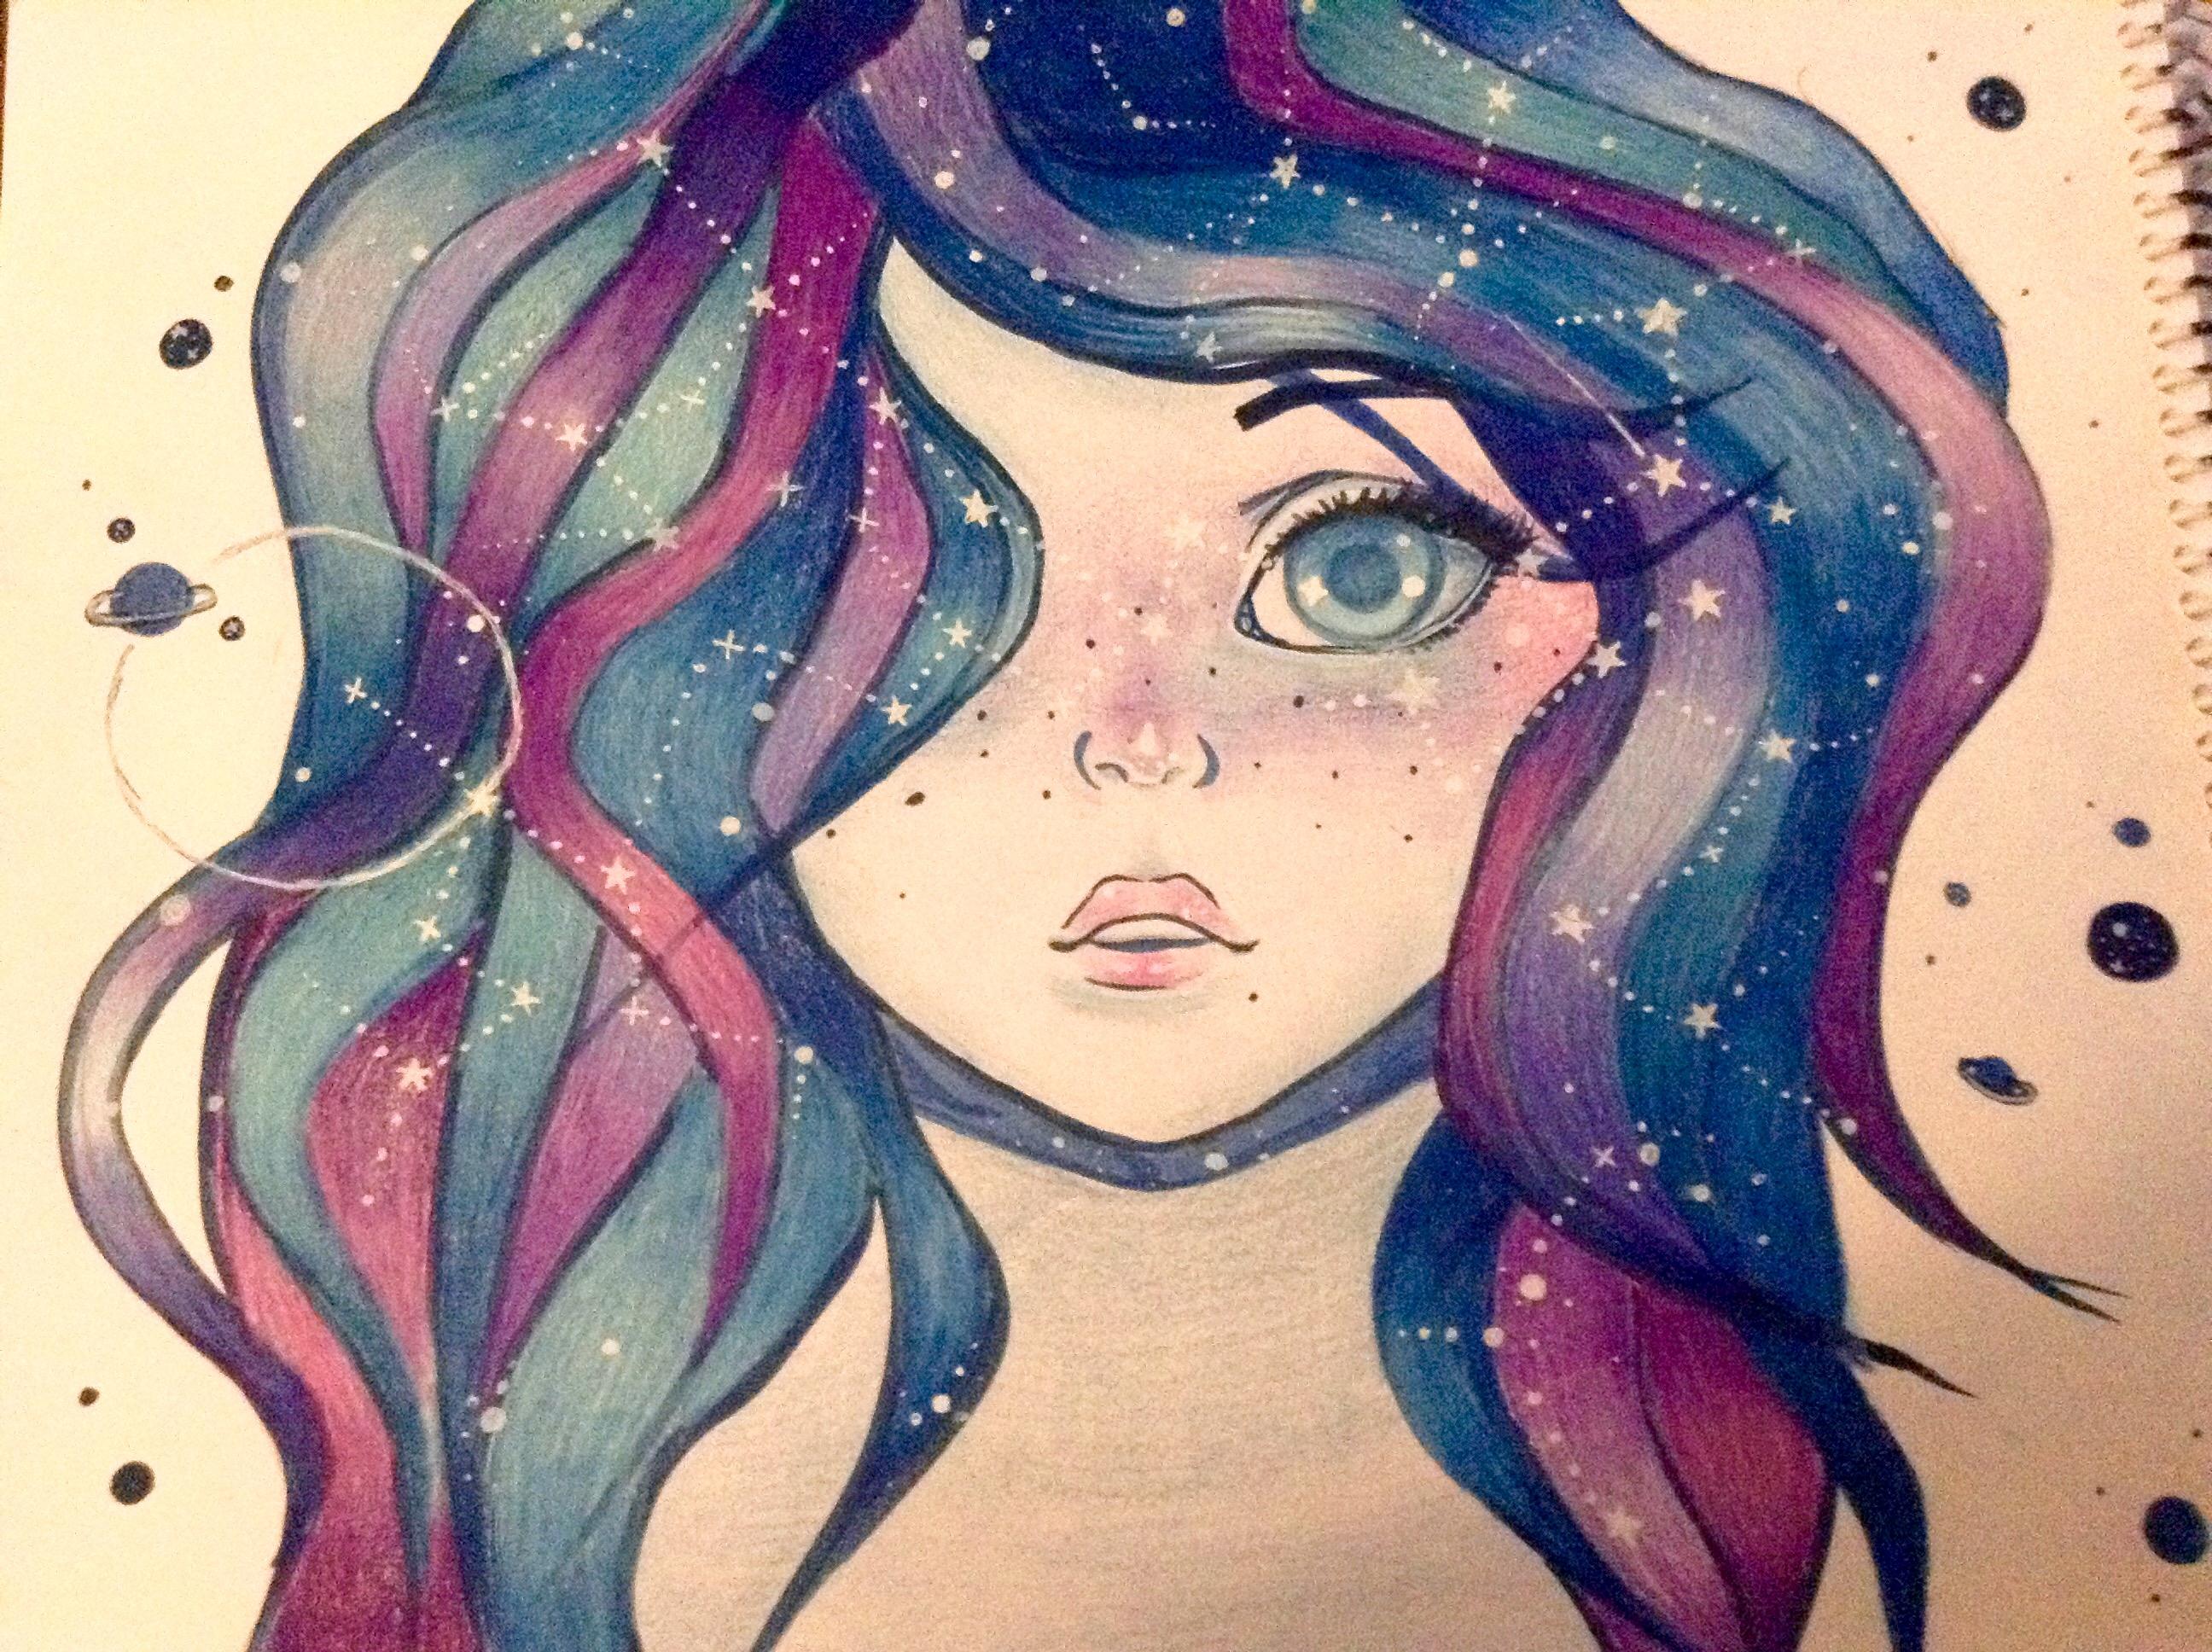 Anime Galaxy Girl by mpinz on DeviantArt